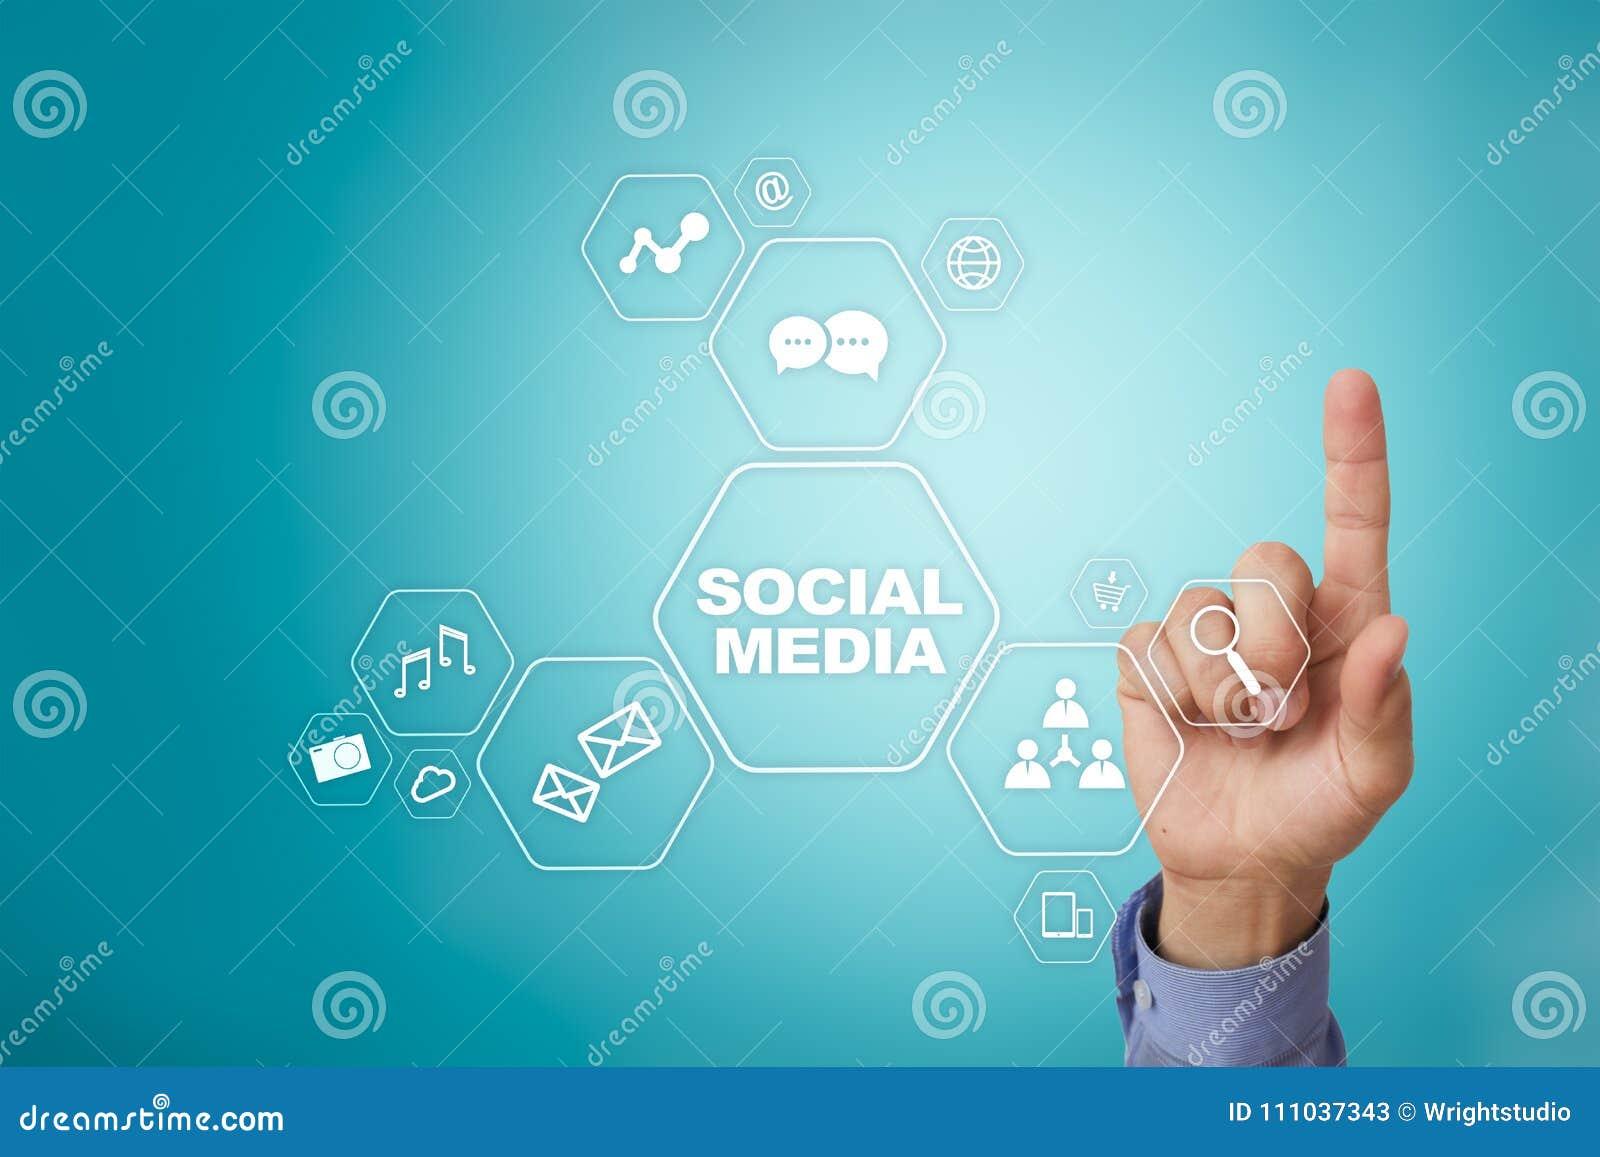 Sociaal media concept op het virtuele scherm SMM marketing Mededeling en Internet-technologie